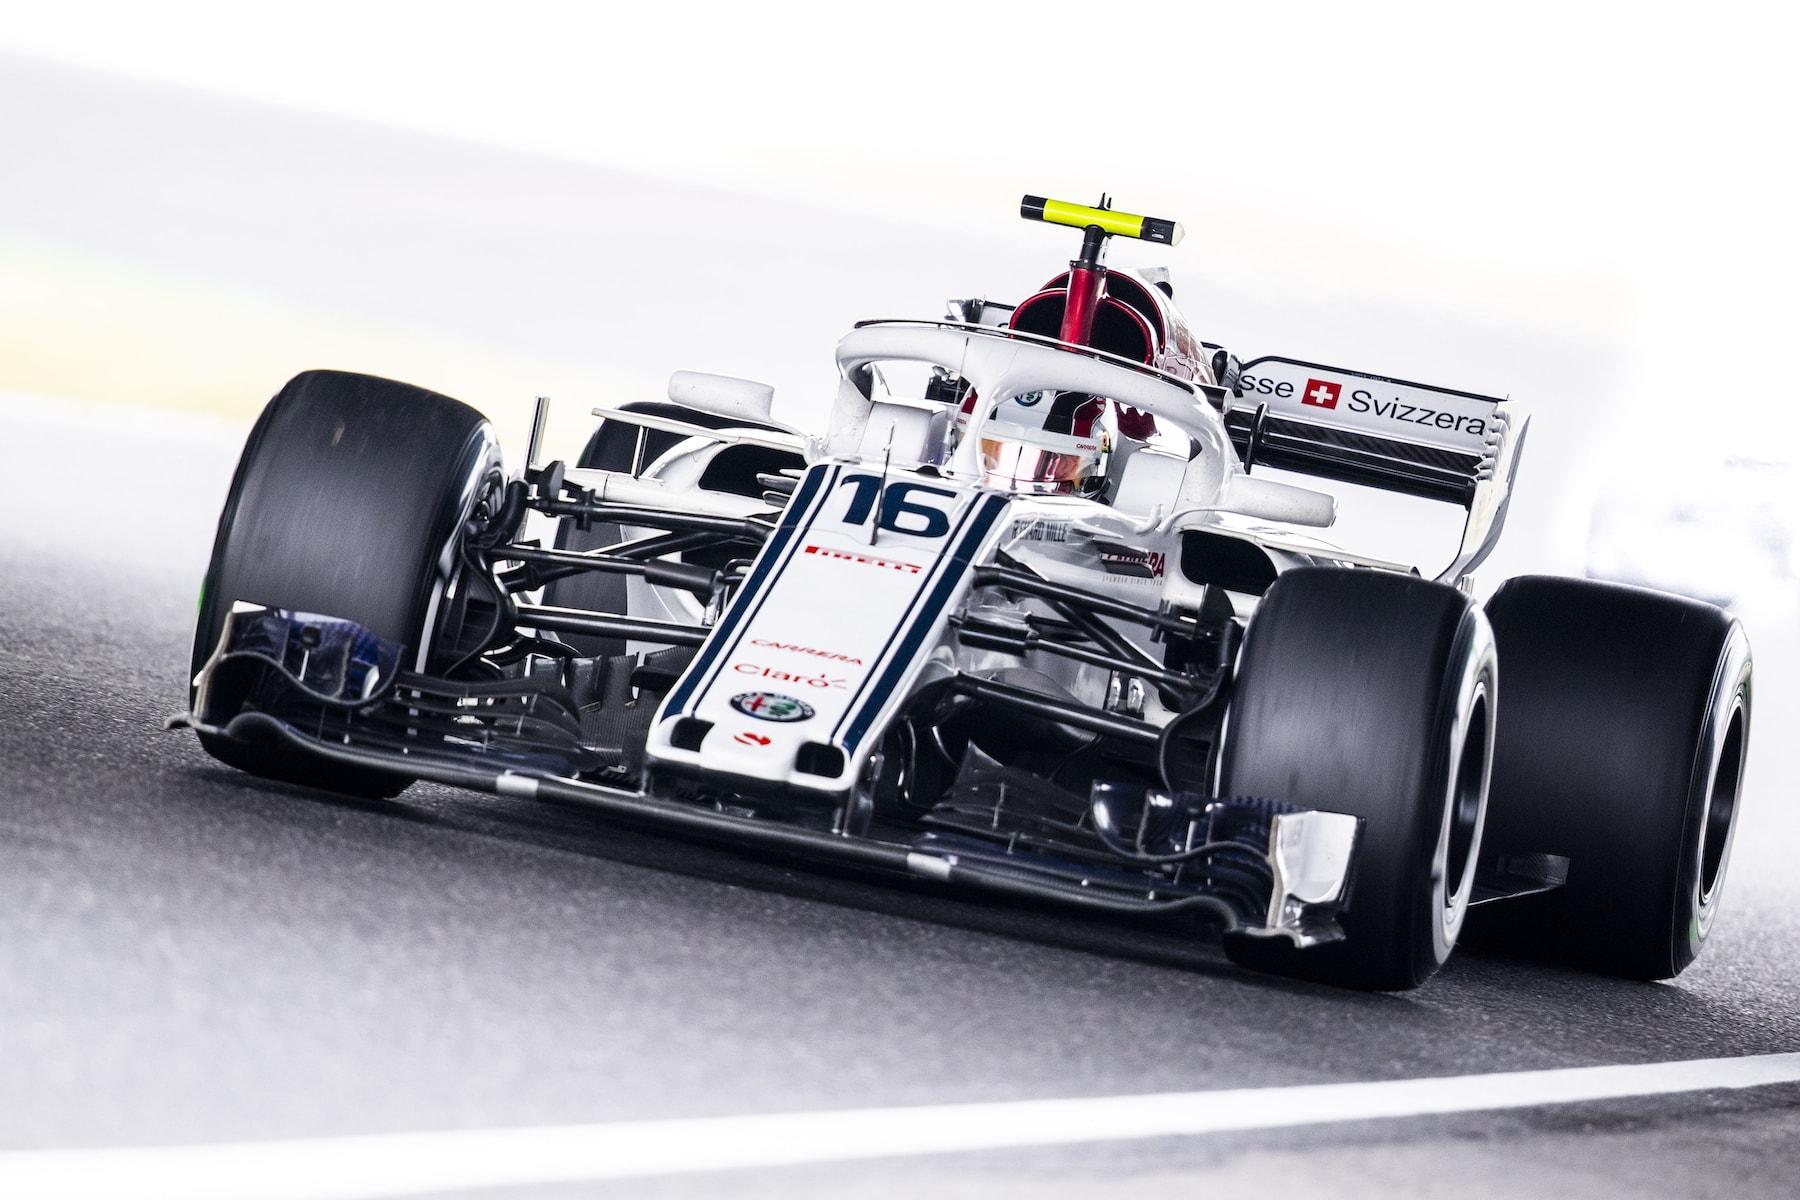 H 2018 Charles Leclerc | Sauber C37 | 2018 Japanese GP 2 copy.jpg